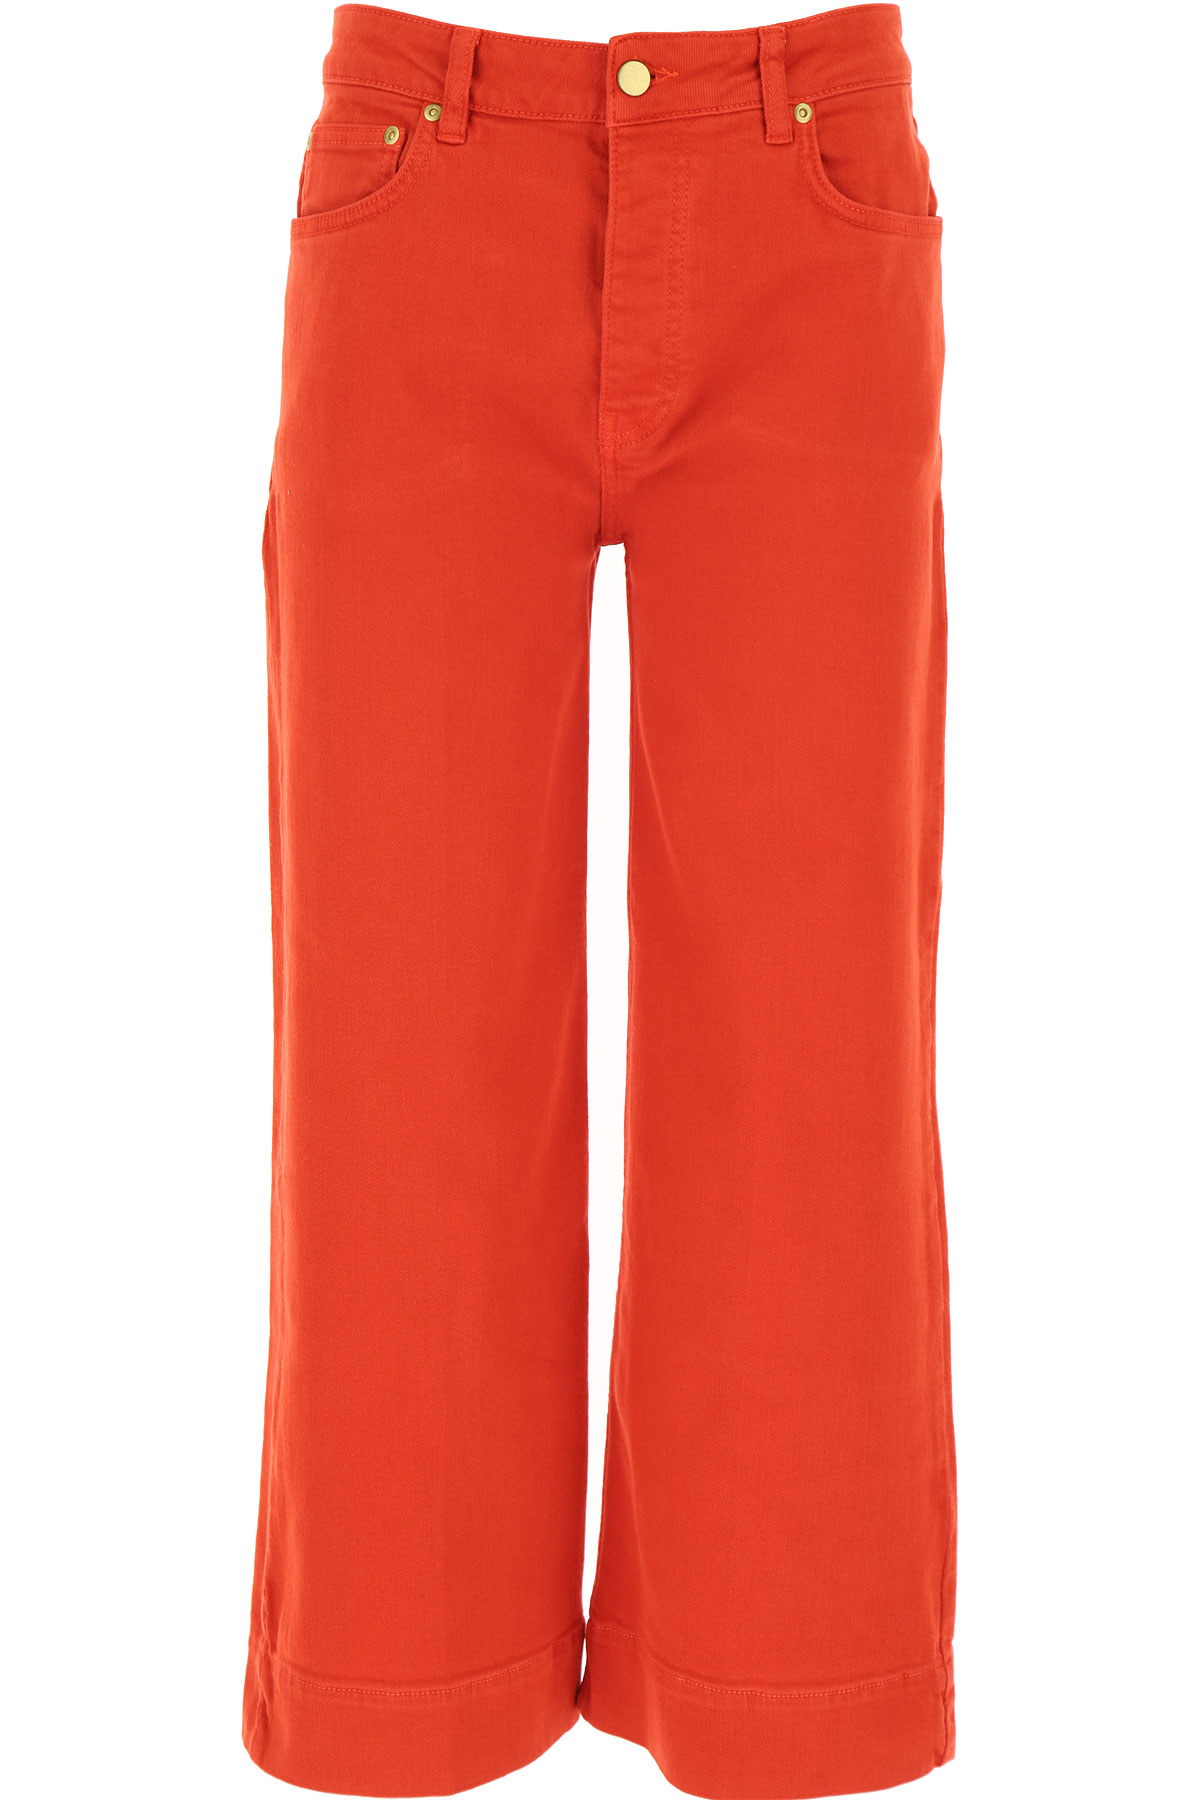 Victoria Beckham Jeans On Sale, Red, Cotton, 2019, 24 25 26 27